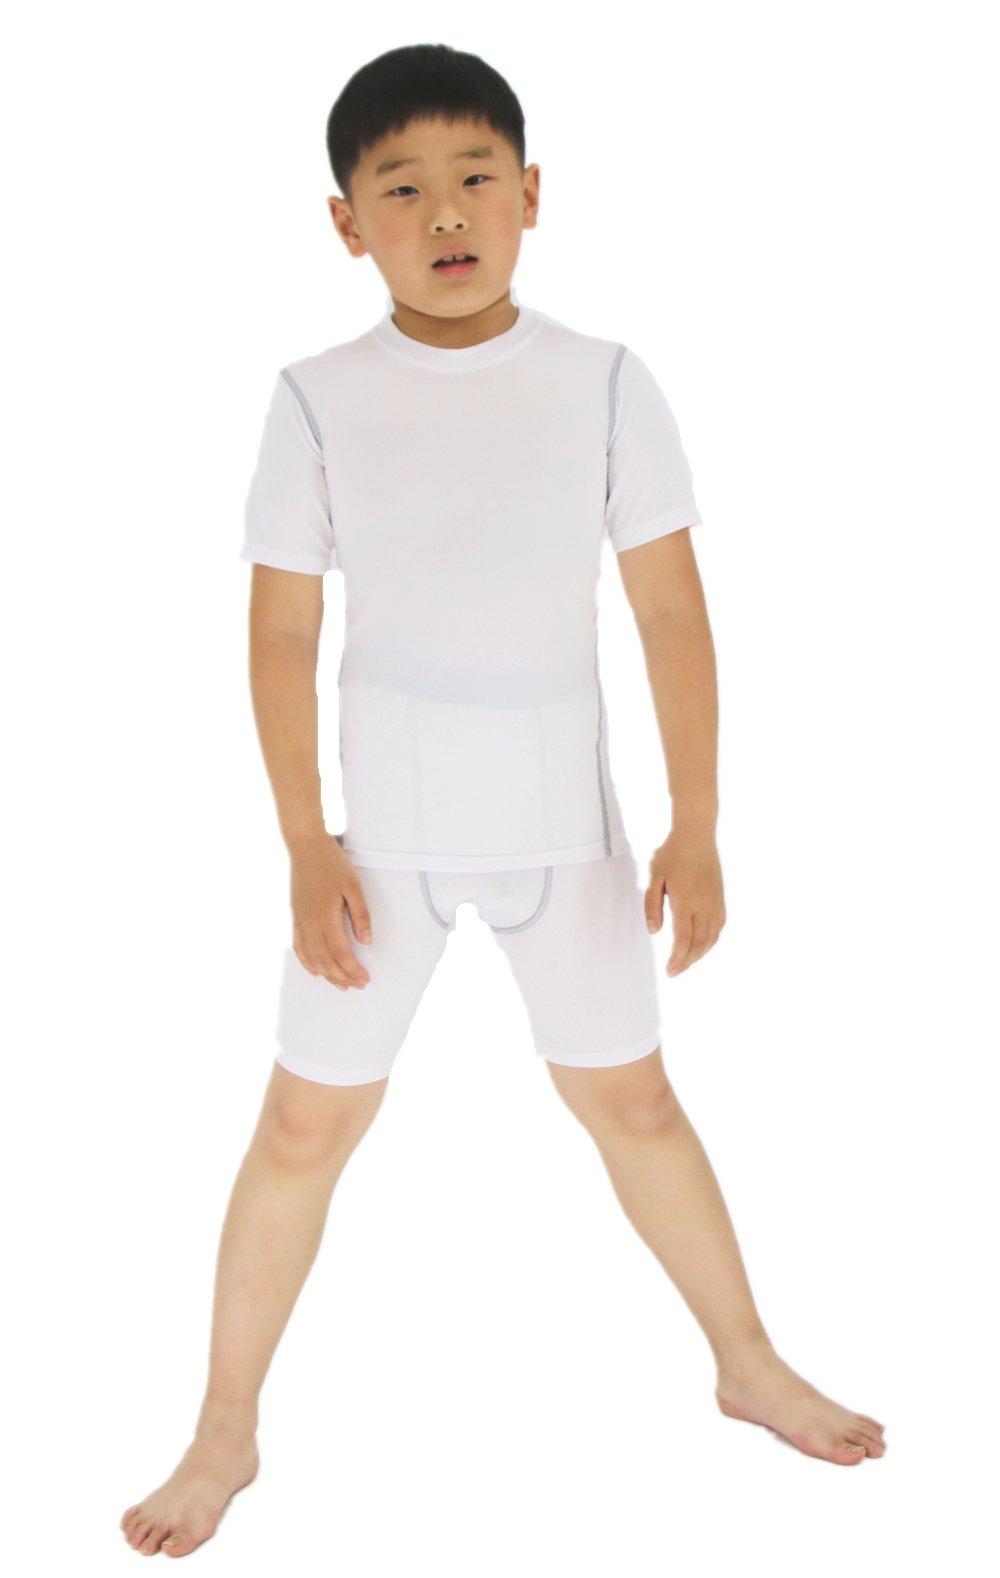 LANBAOSI Boy's Compression Shirts Pants Child's Short Sleeve Base Layer Set (7, White)